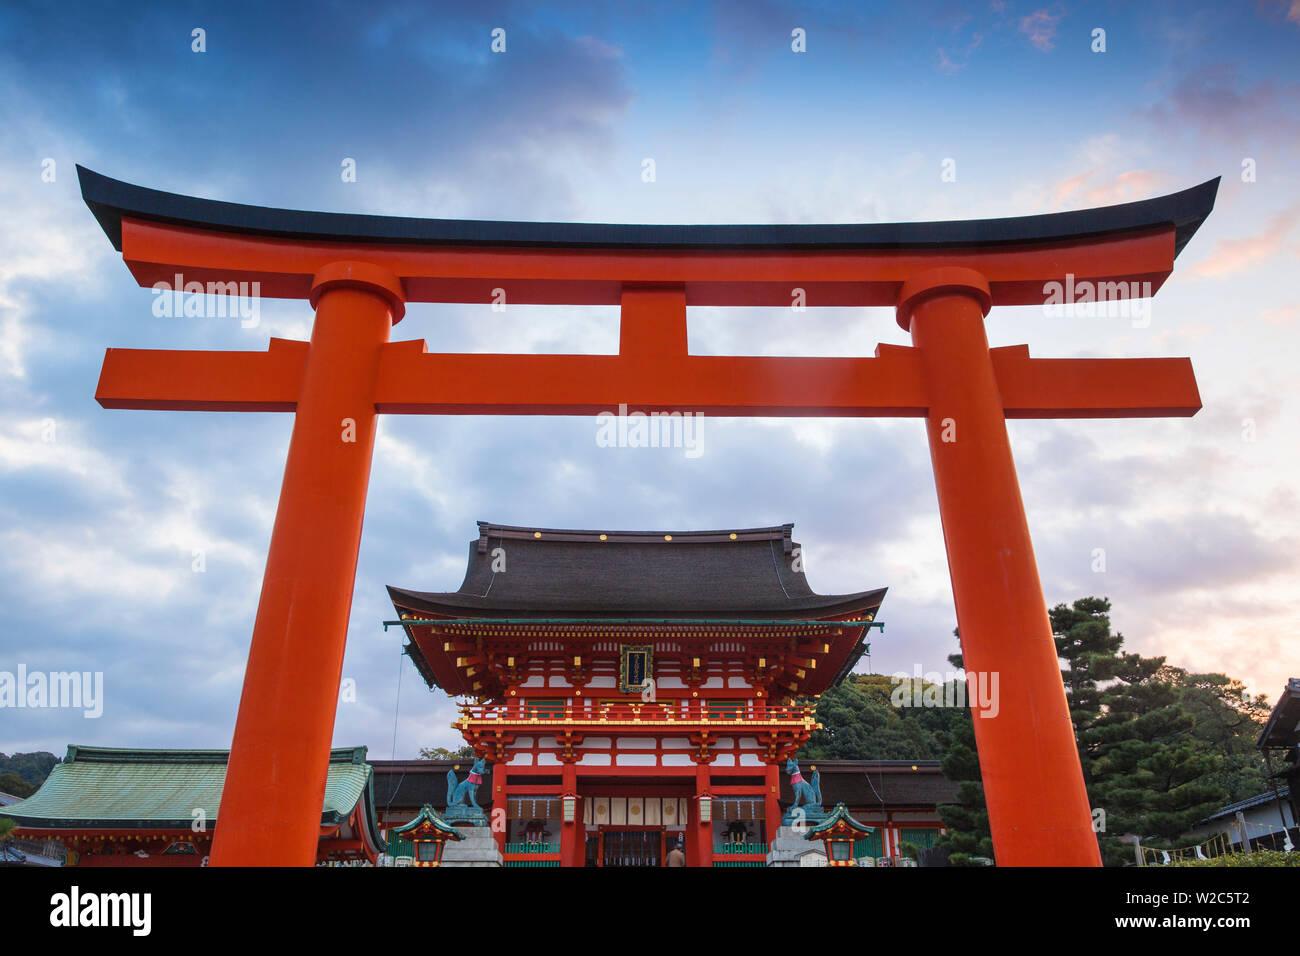 Japan, Kyoto, Fushimi Inari Shrine - Stock Image